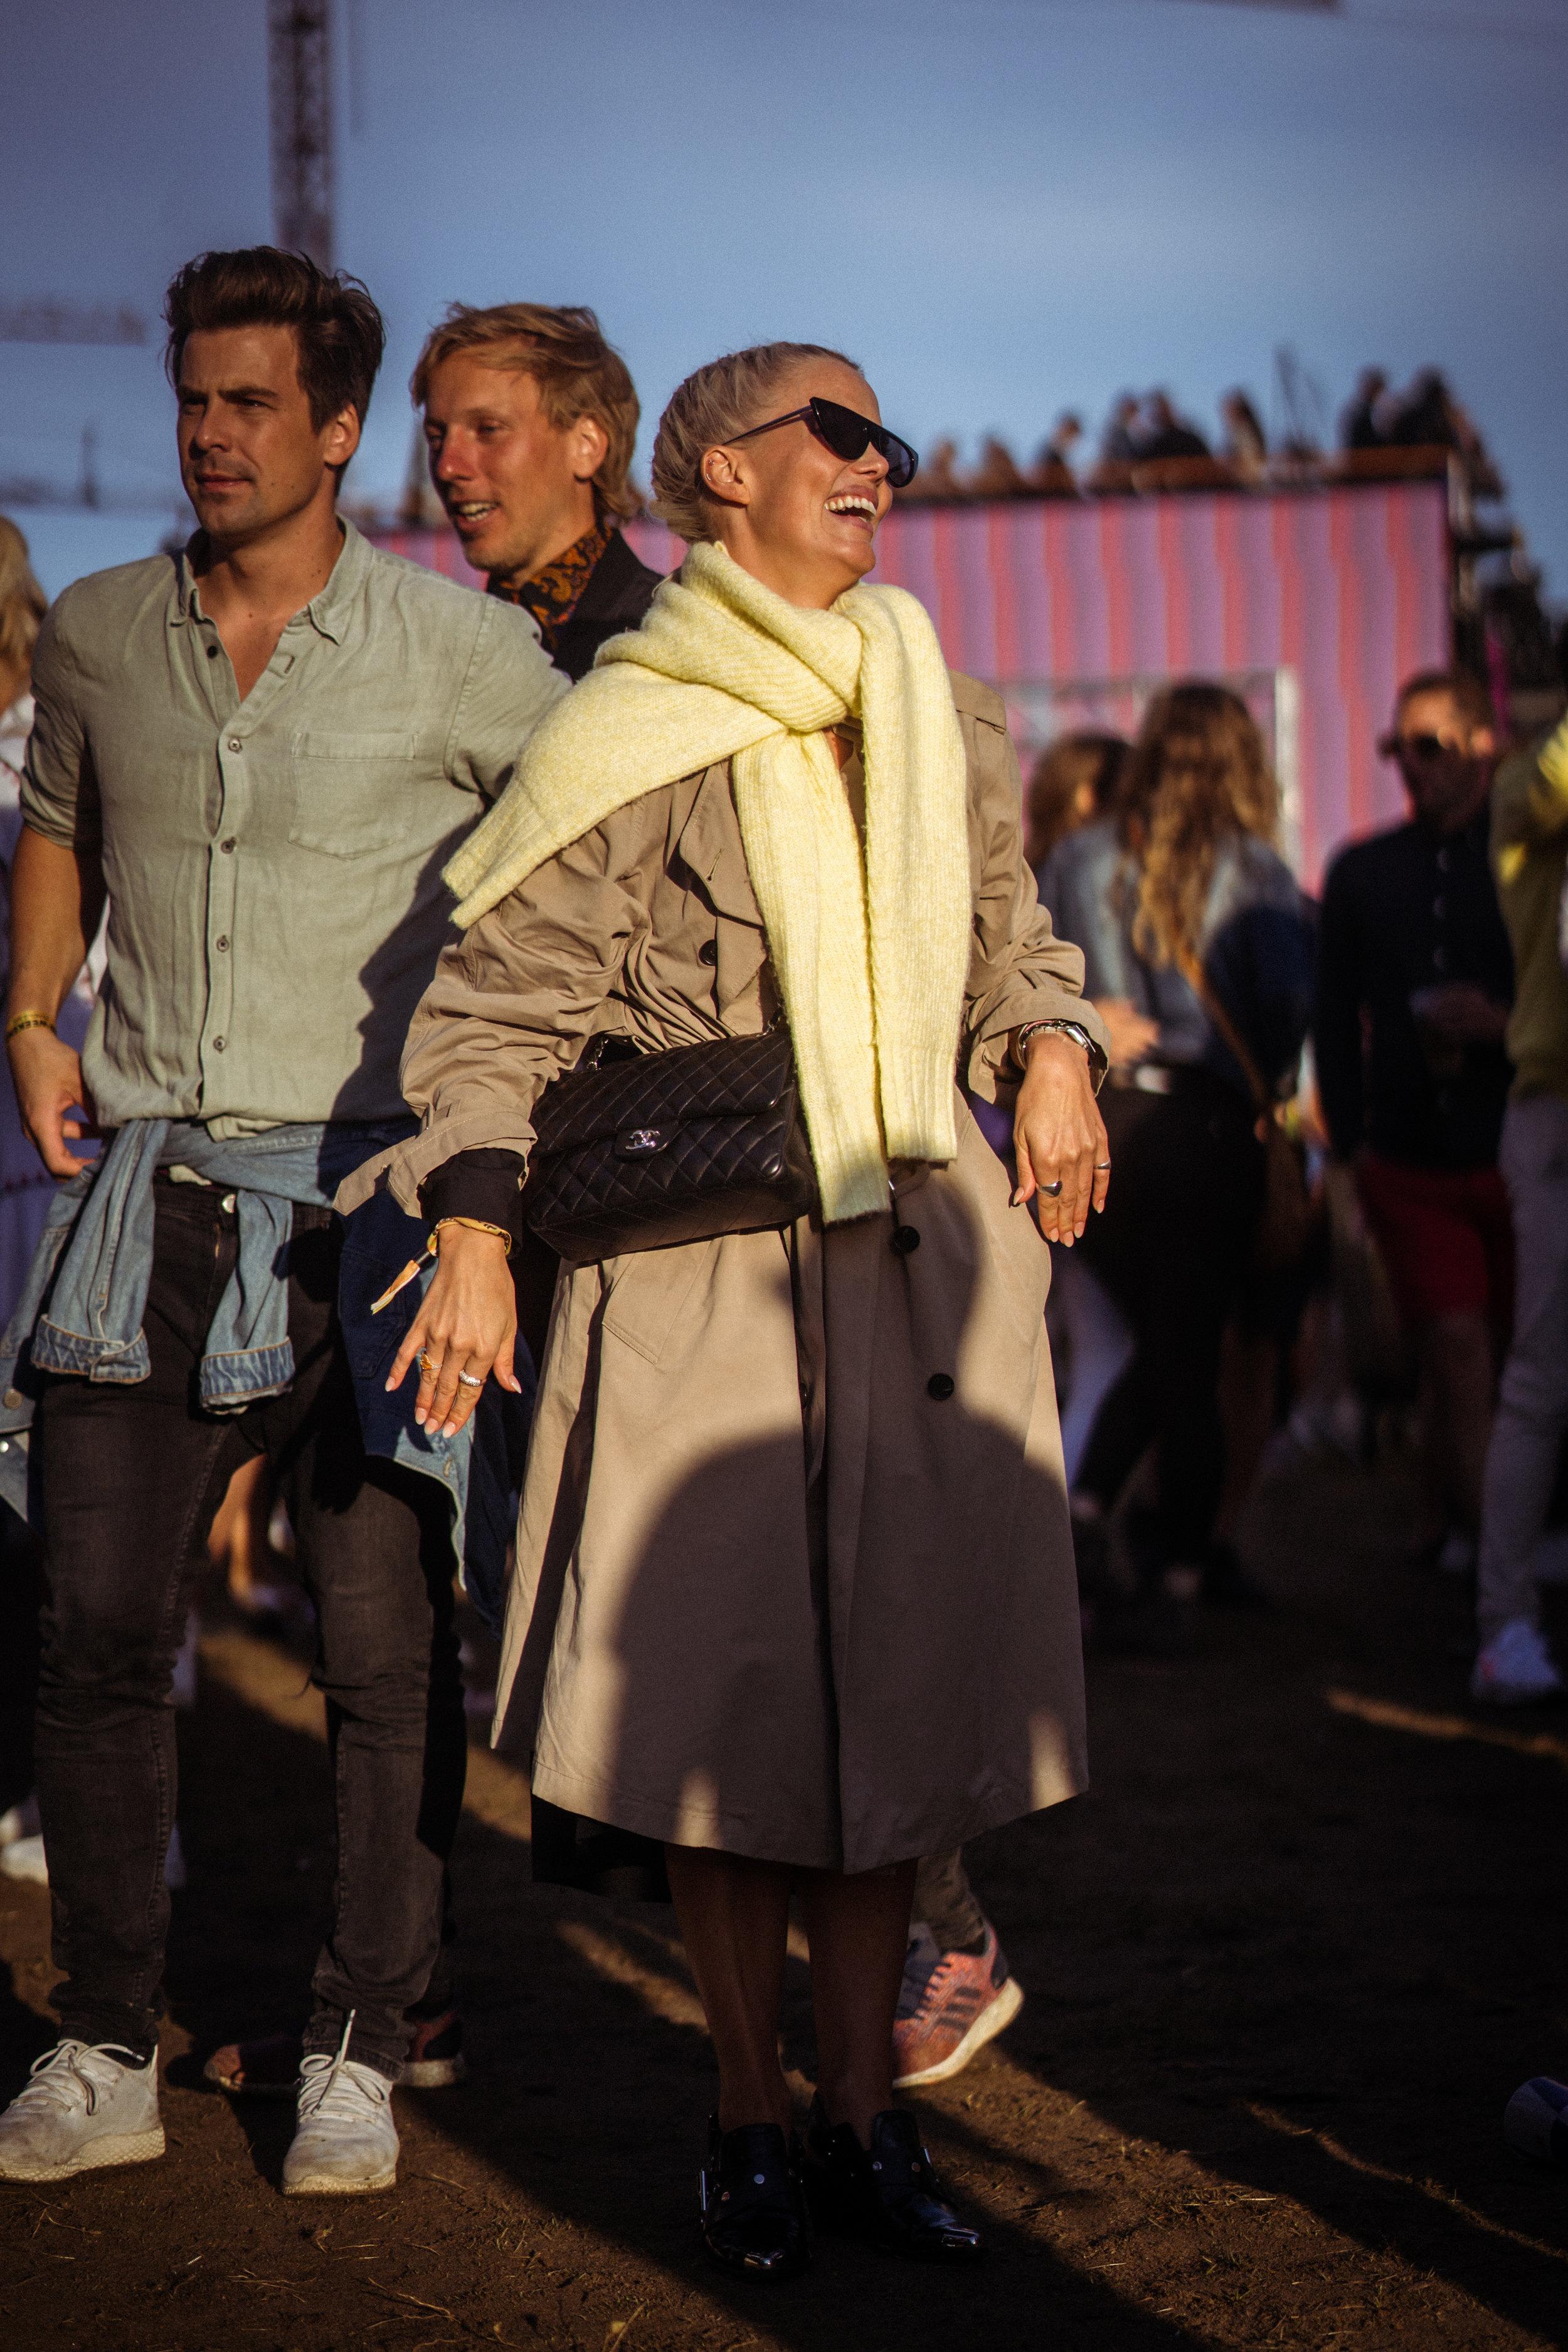 Caroline Nilsen    looking oh-so-stylish in her classic beige trench coat and Chanel bag! Photo: Sander Berhus / Estér Magazine.